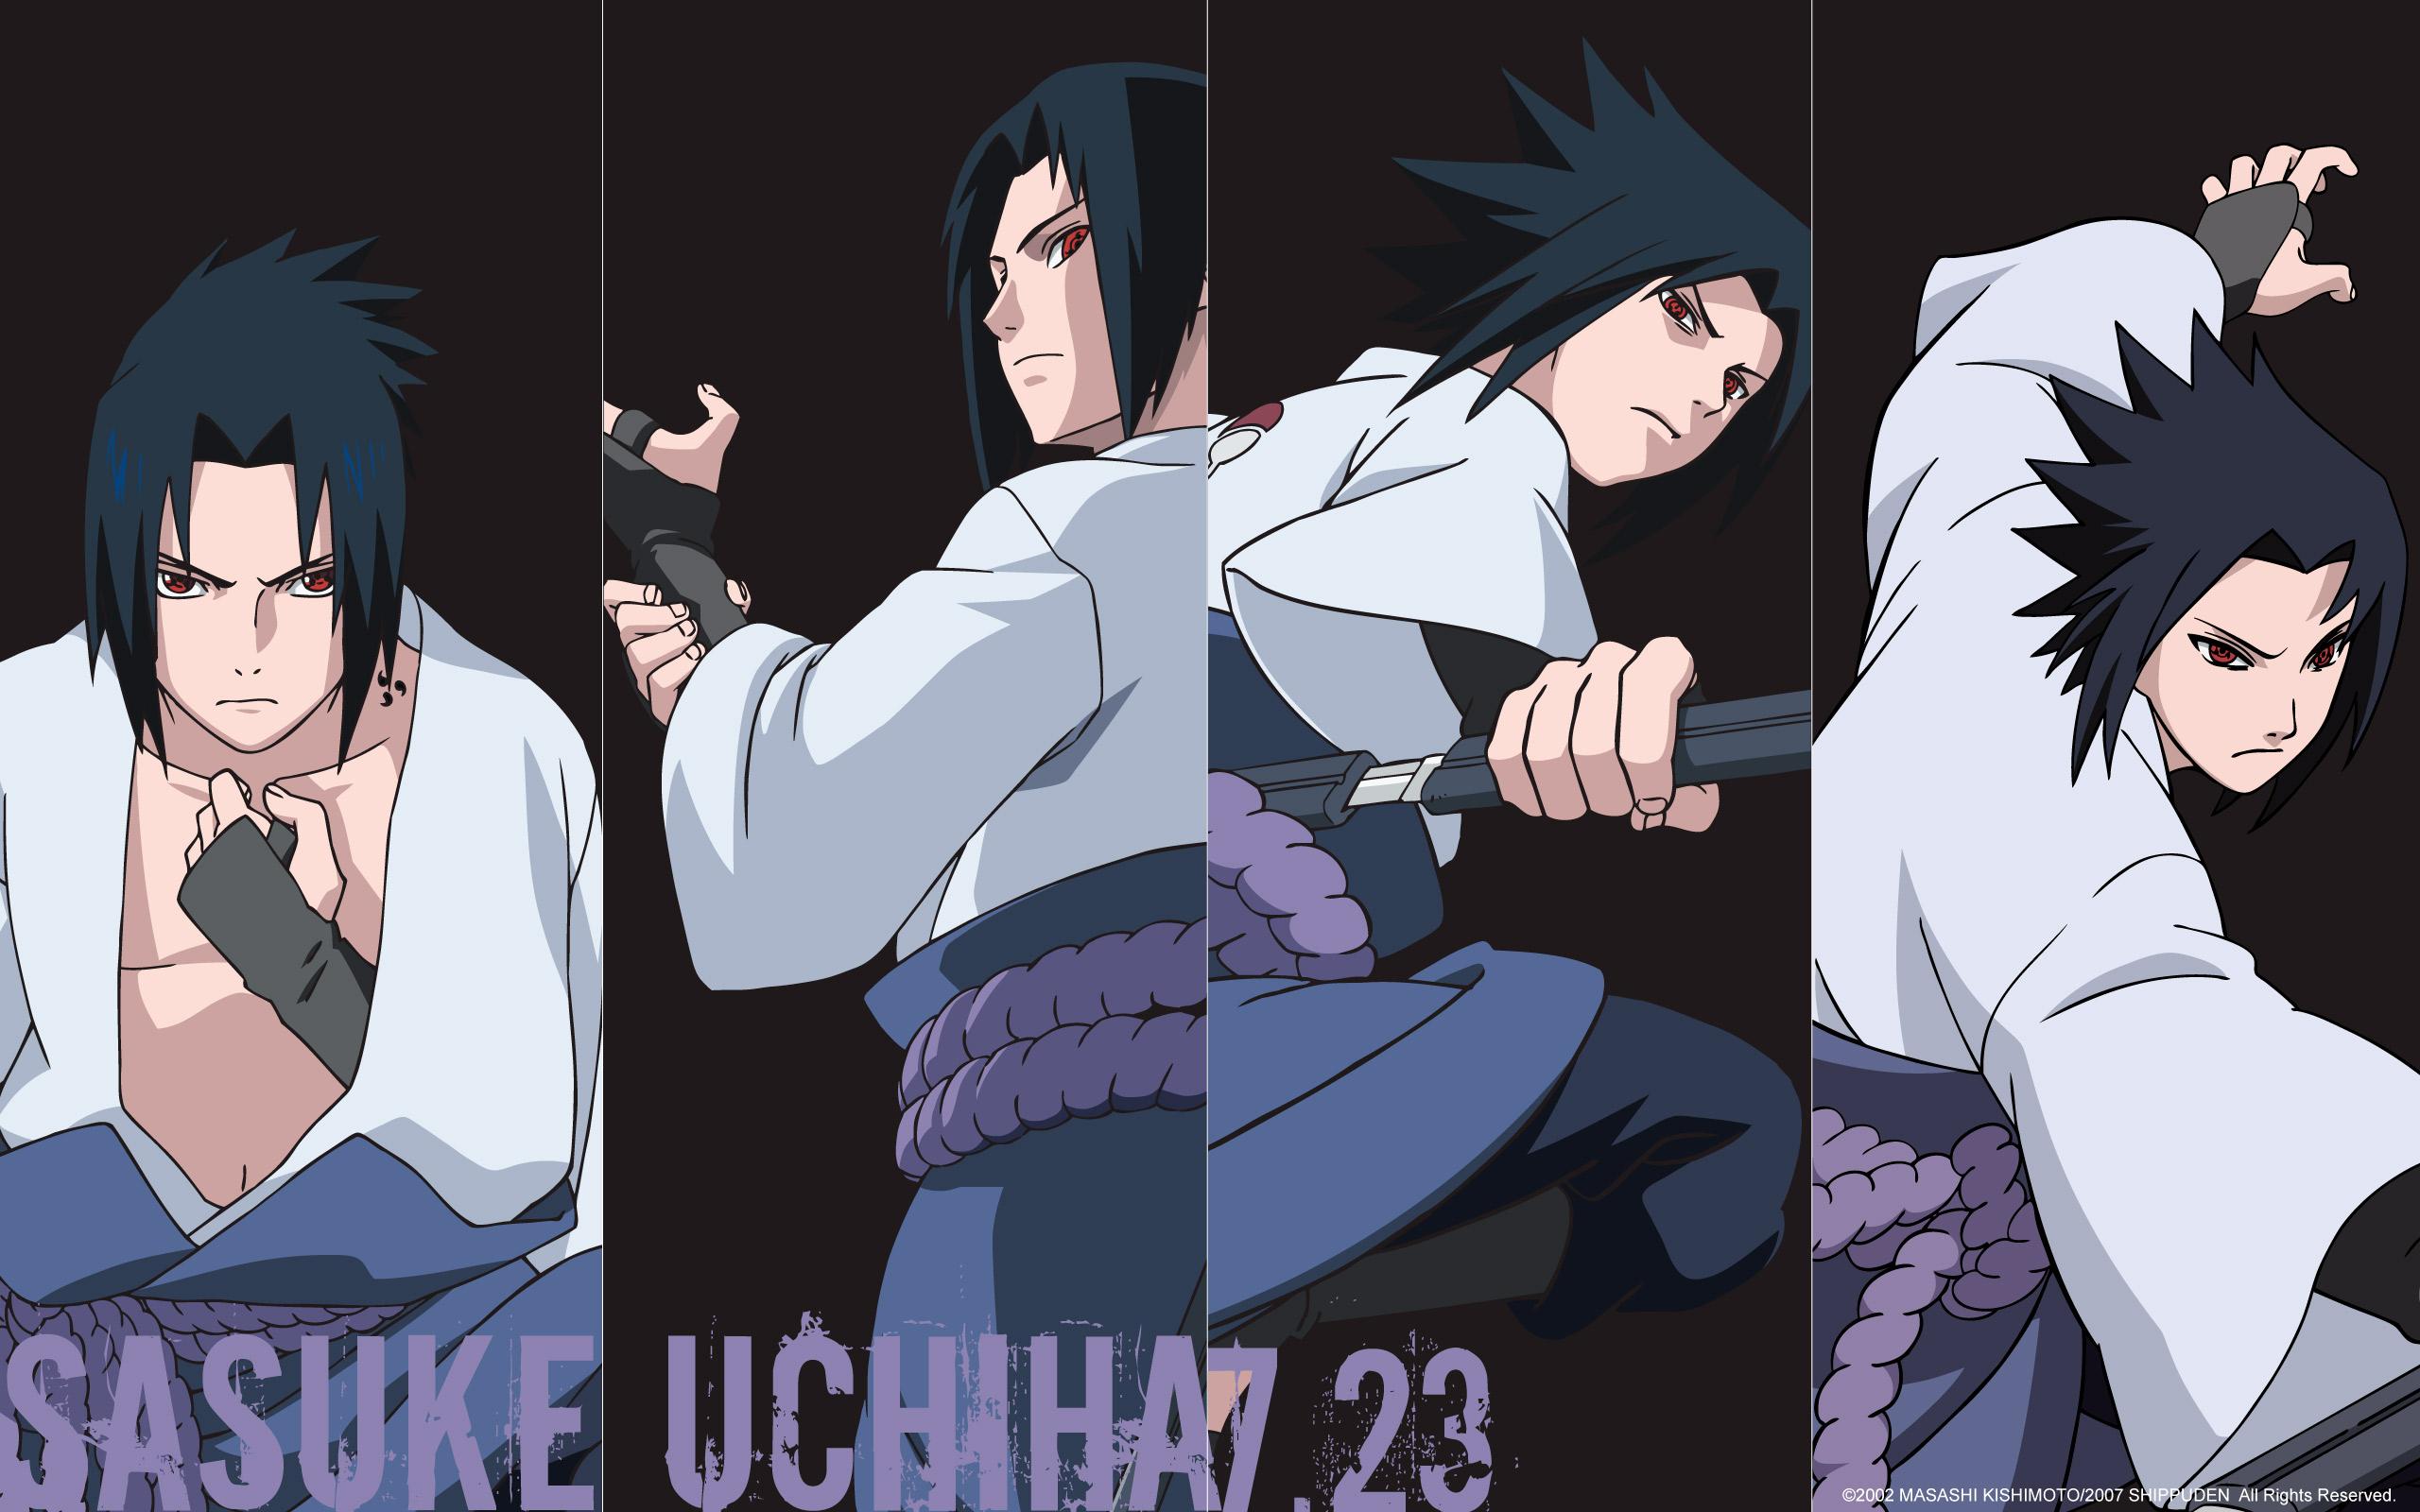 Unduh 46+ Background Anime Sasuke Gratis Terbaru